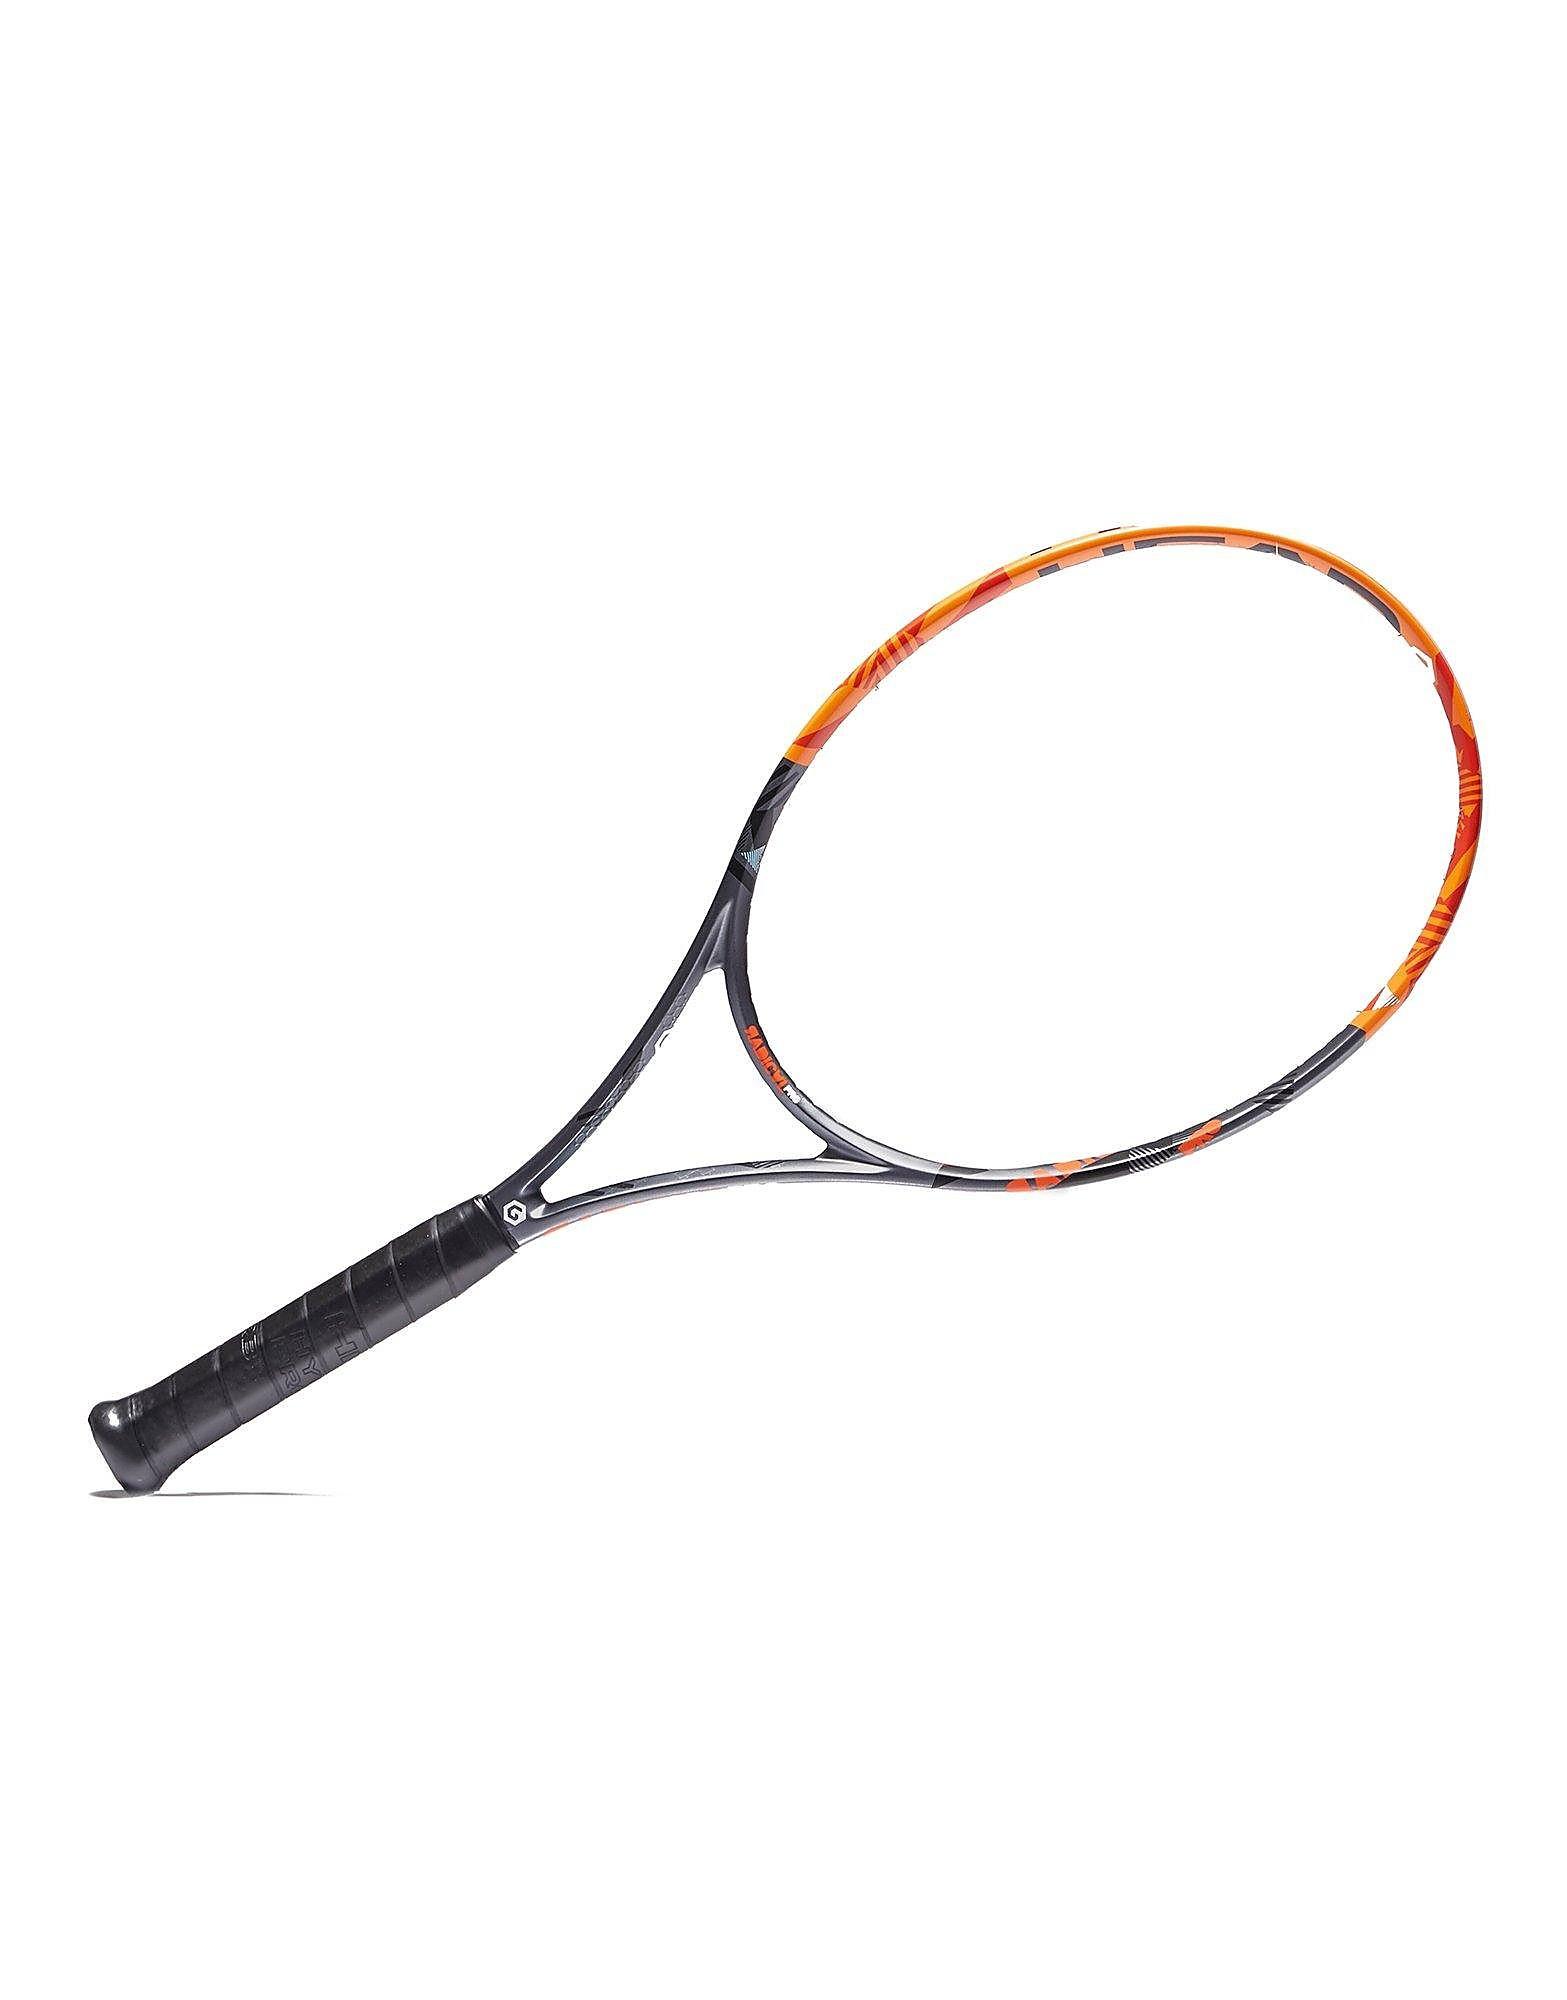 Head Graphene XT Radical Pro Tennis Racket